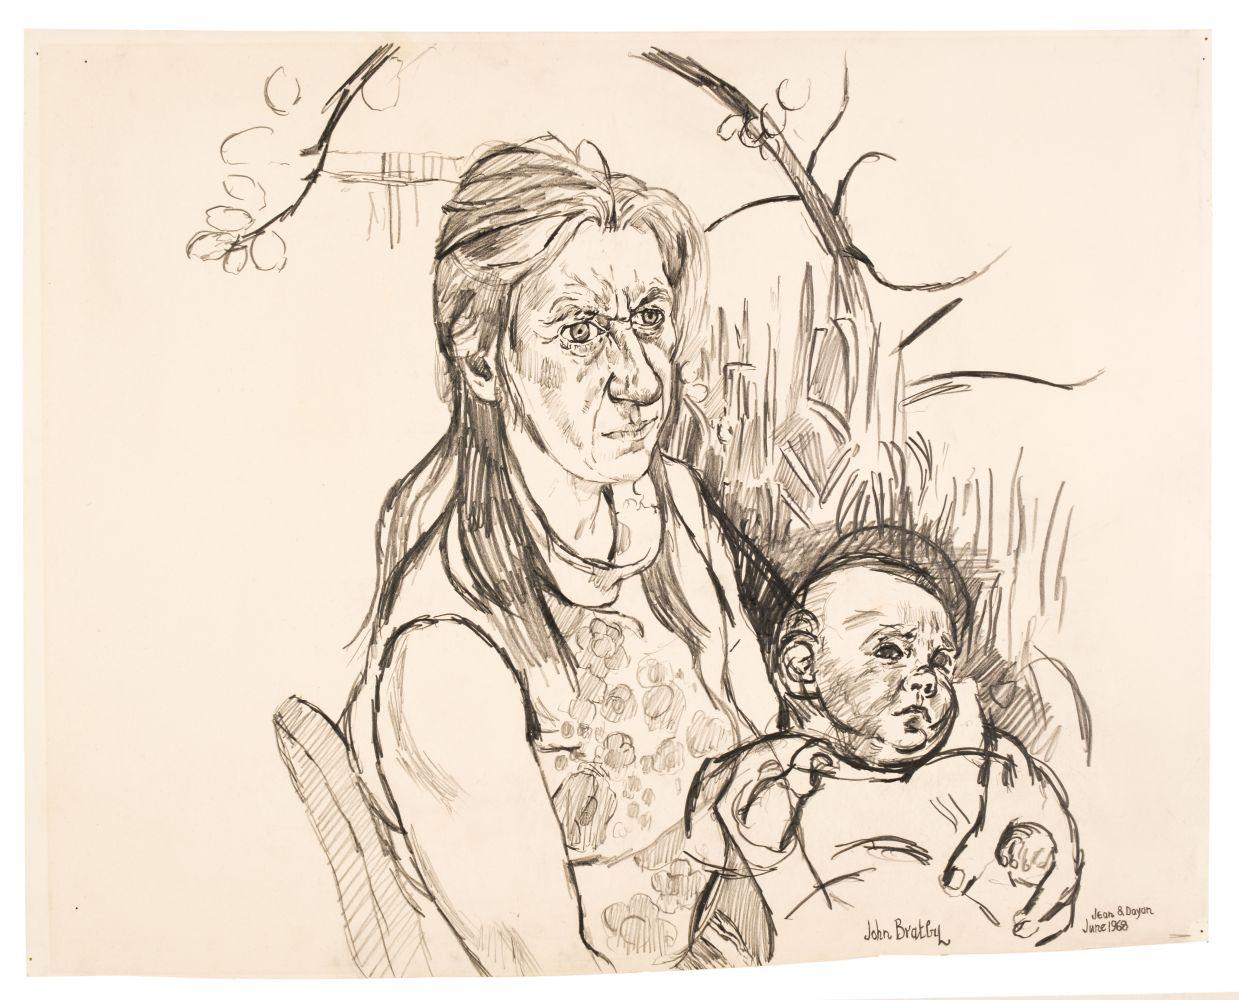 ARR * § Bratby (John Randall, 1928-1992). Jean & Dayan, June 1968